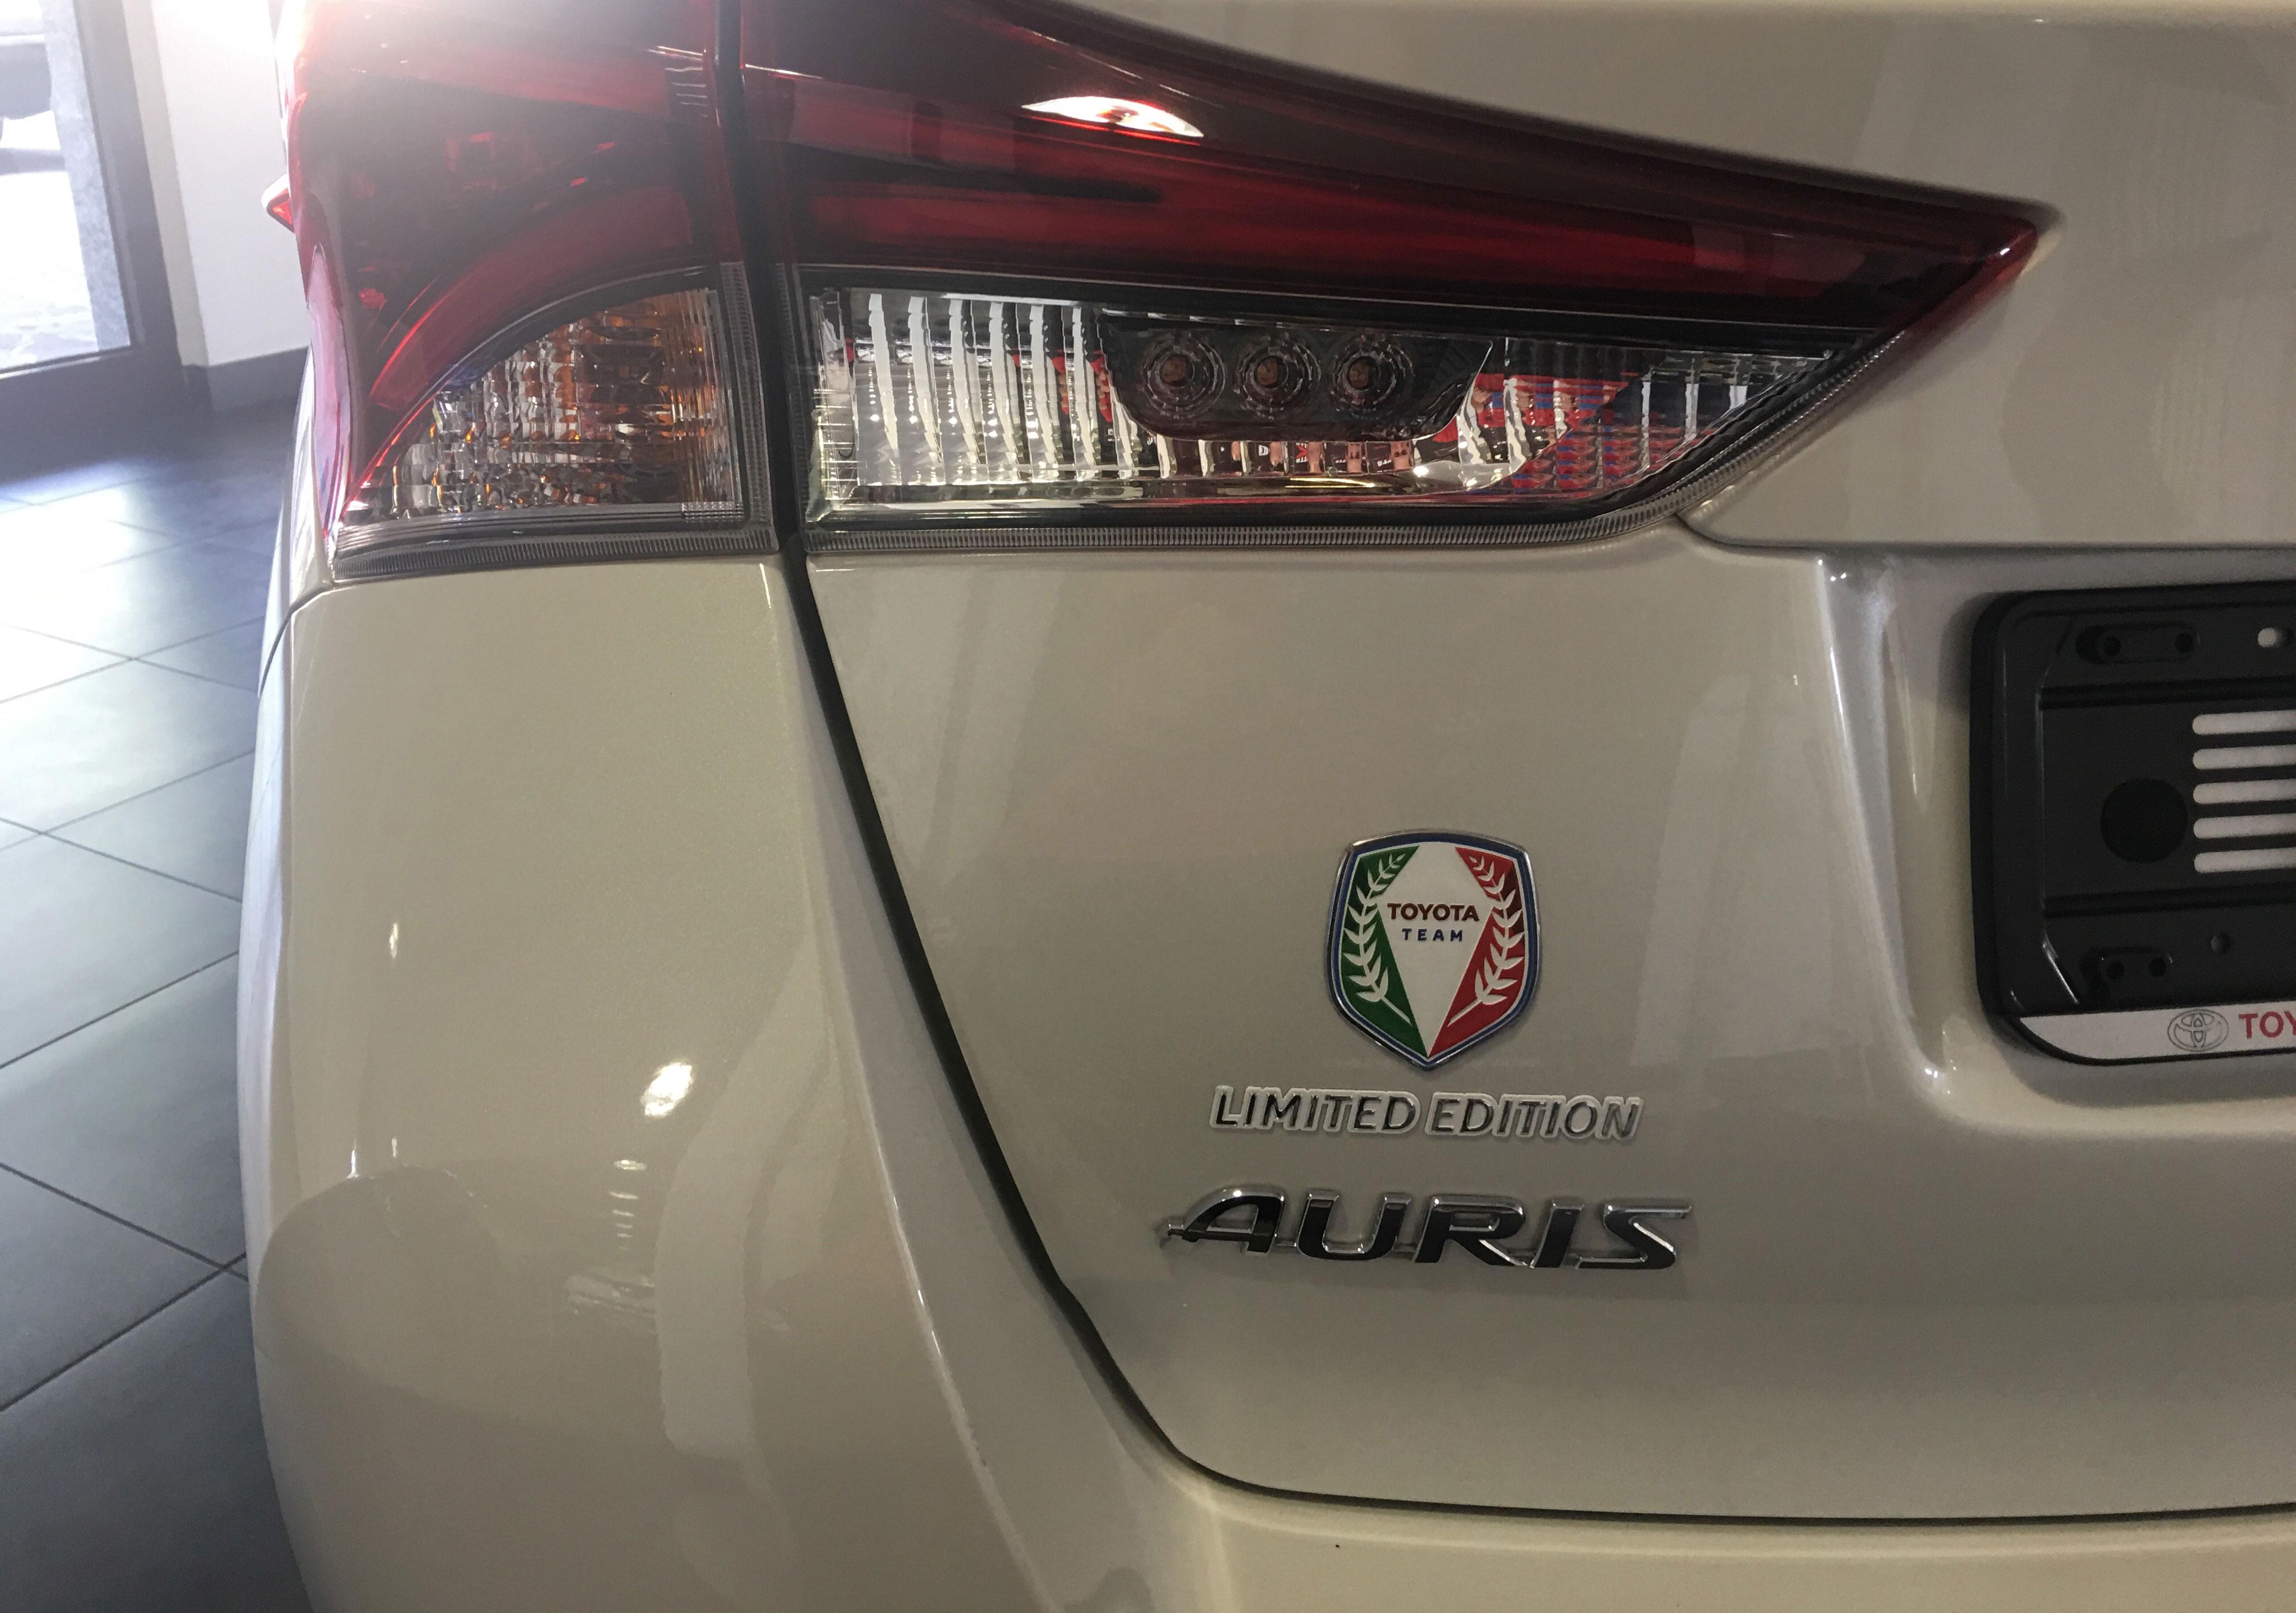 Foto della Toyota Auris Touring Sports Toyota team Limited Edition